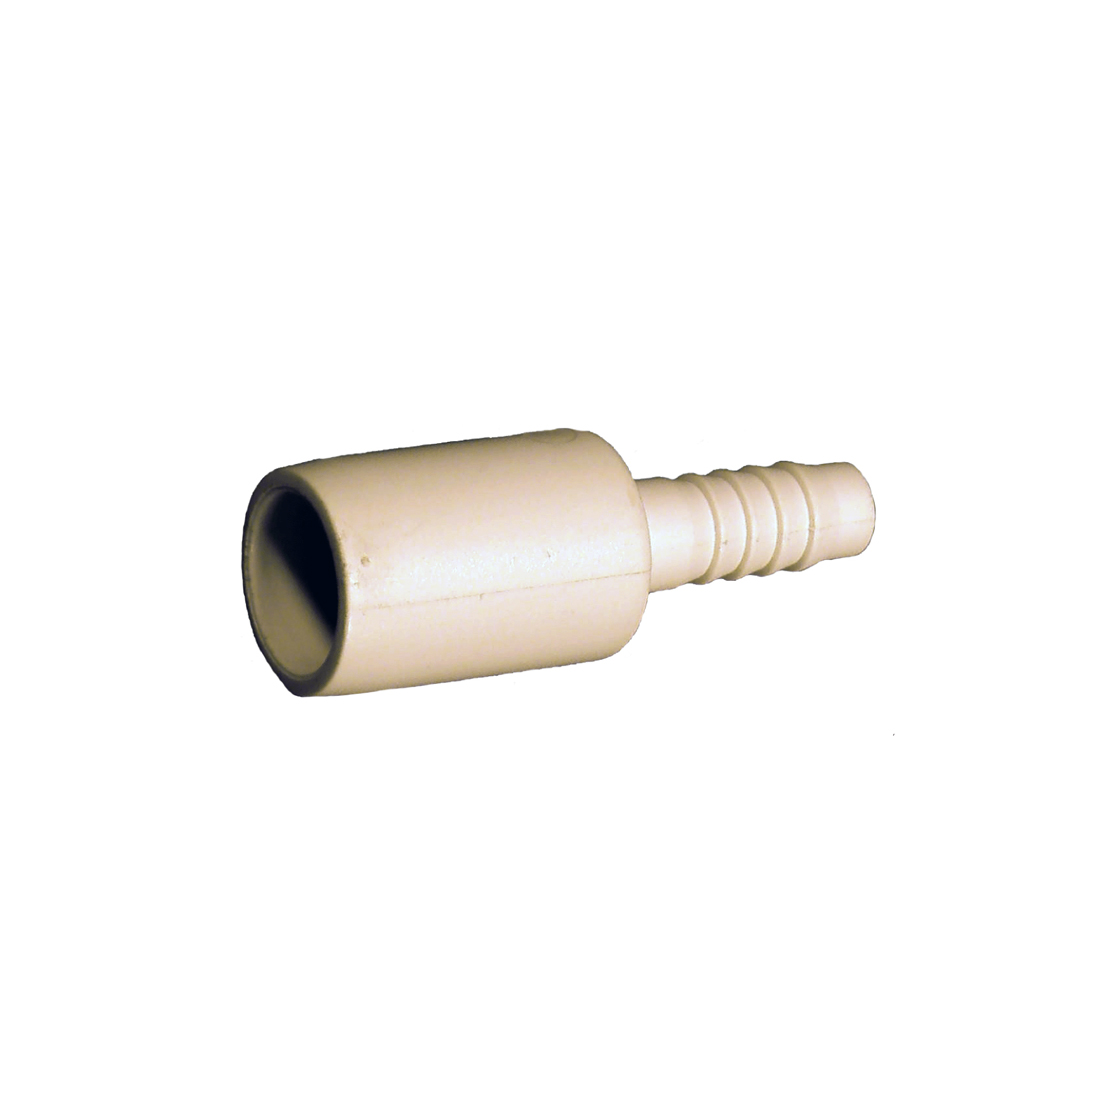 Condensate Drain Adaptor 22mm 3 8